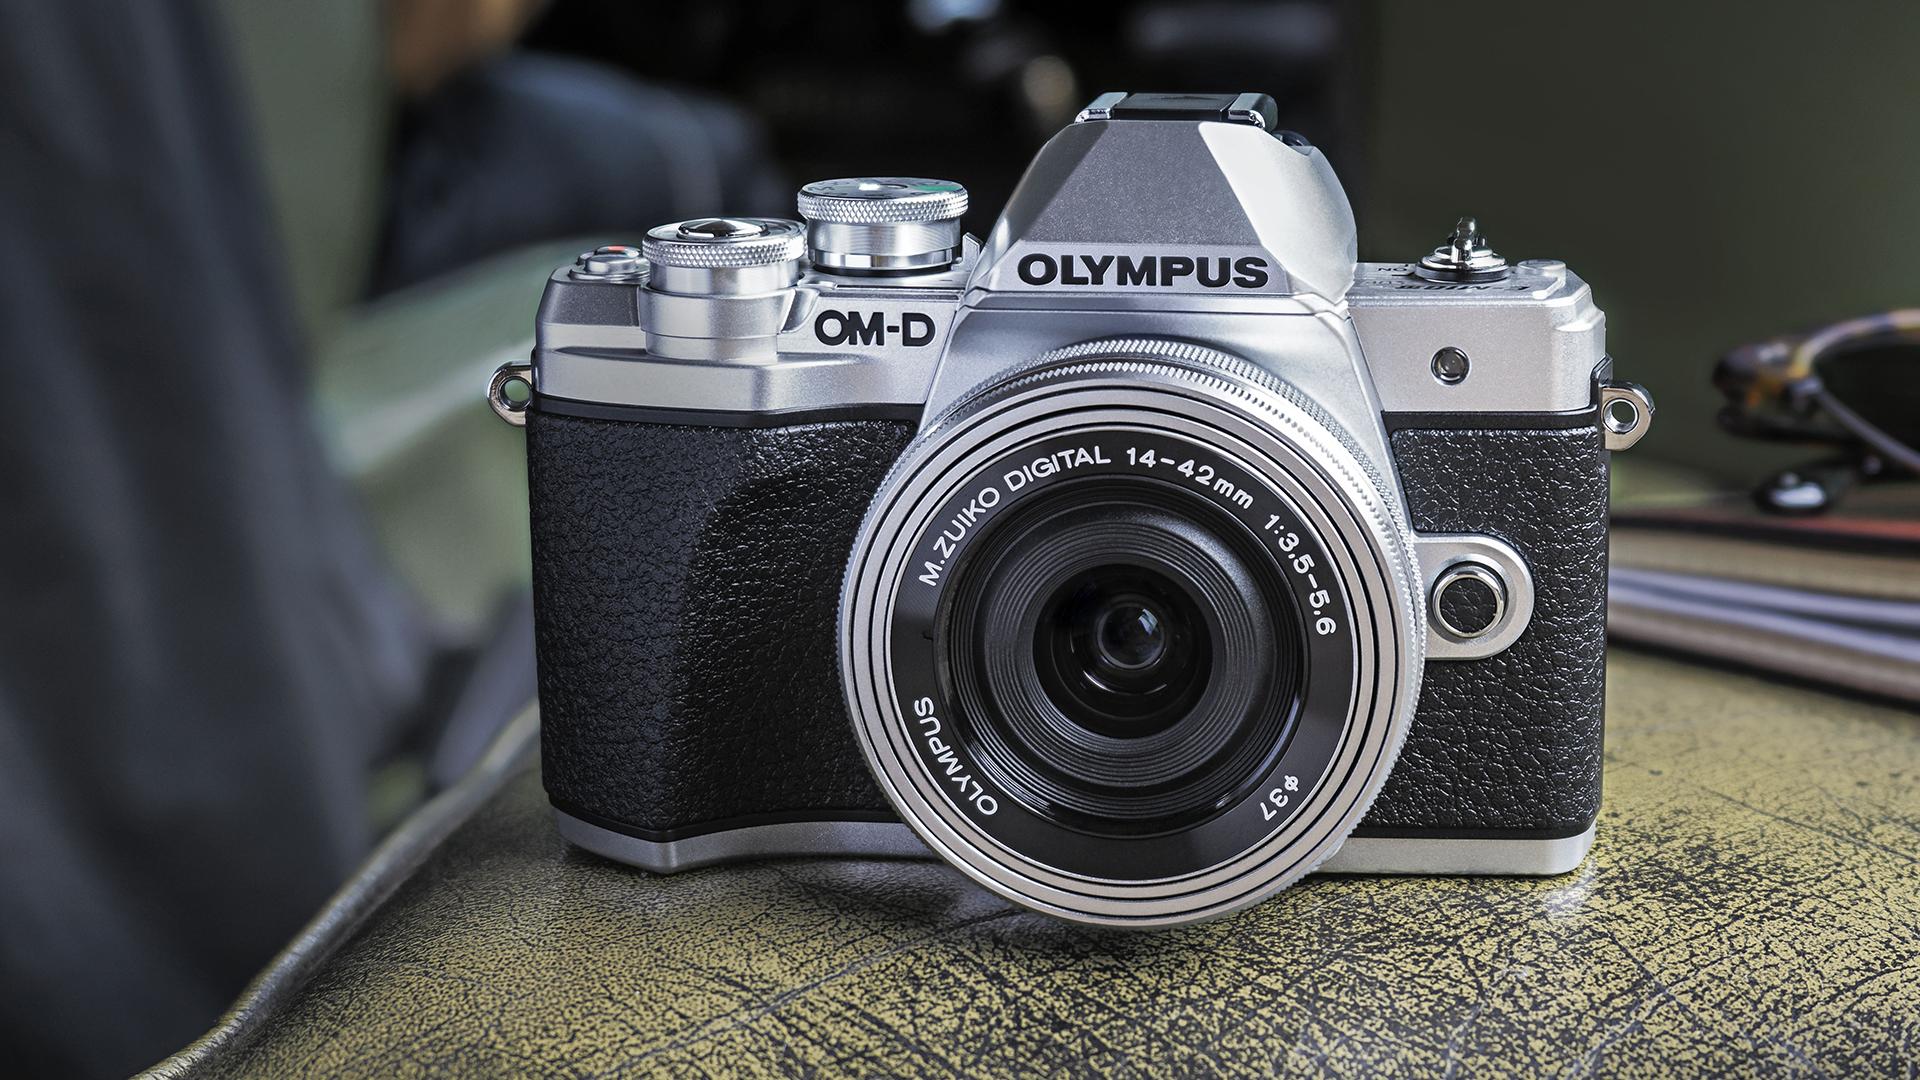 Olympus OM-D E-M10 Mark III – parem ergonoomika ning 4K video